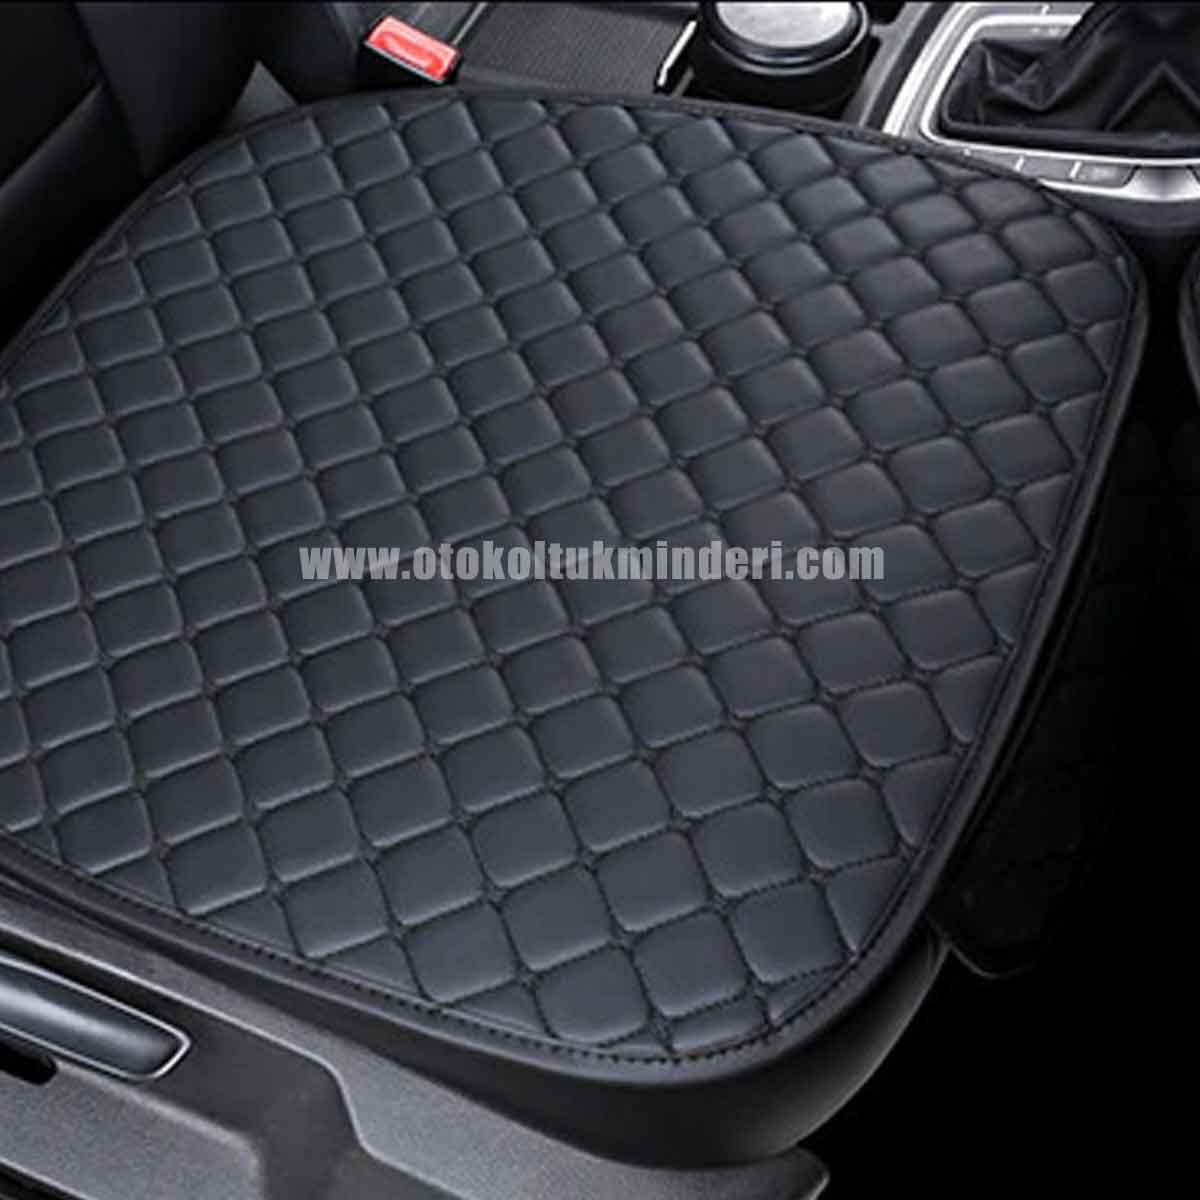 Fiat oto koltuk kılıfı